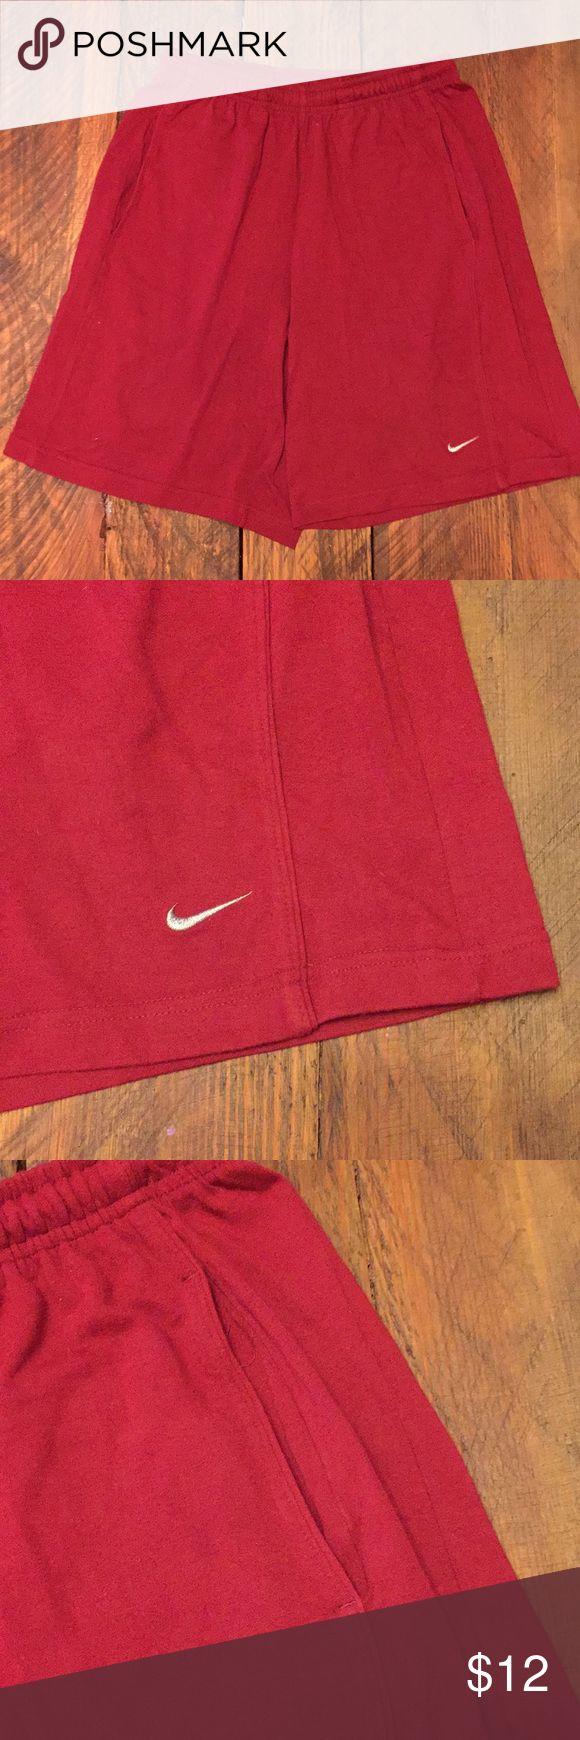 Nike cotton shorts in men's large Nike cotton shorts in men's large.  Garnet/deep red in color.  Nike swoosh on lower left leg.  Drawstring waist and pockets. Nike Shorts